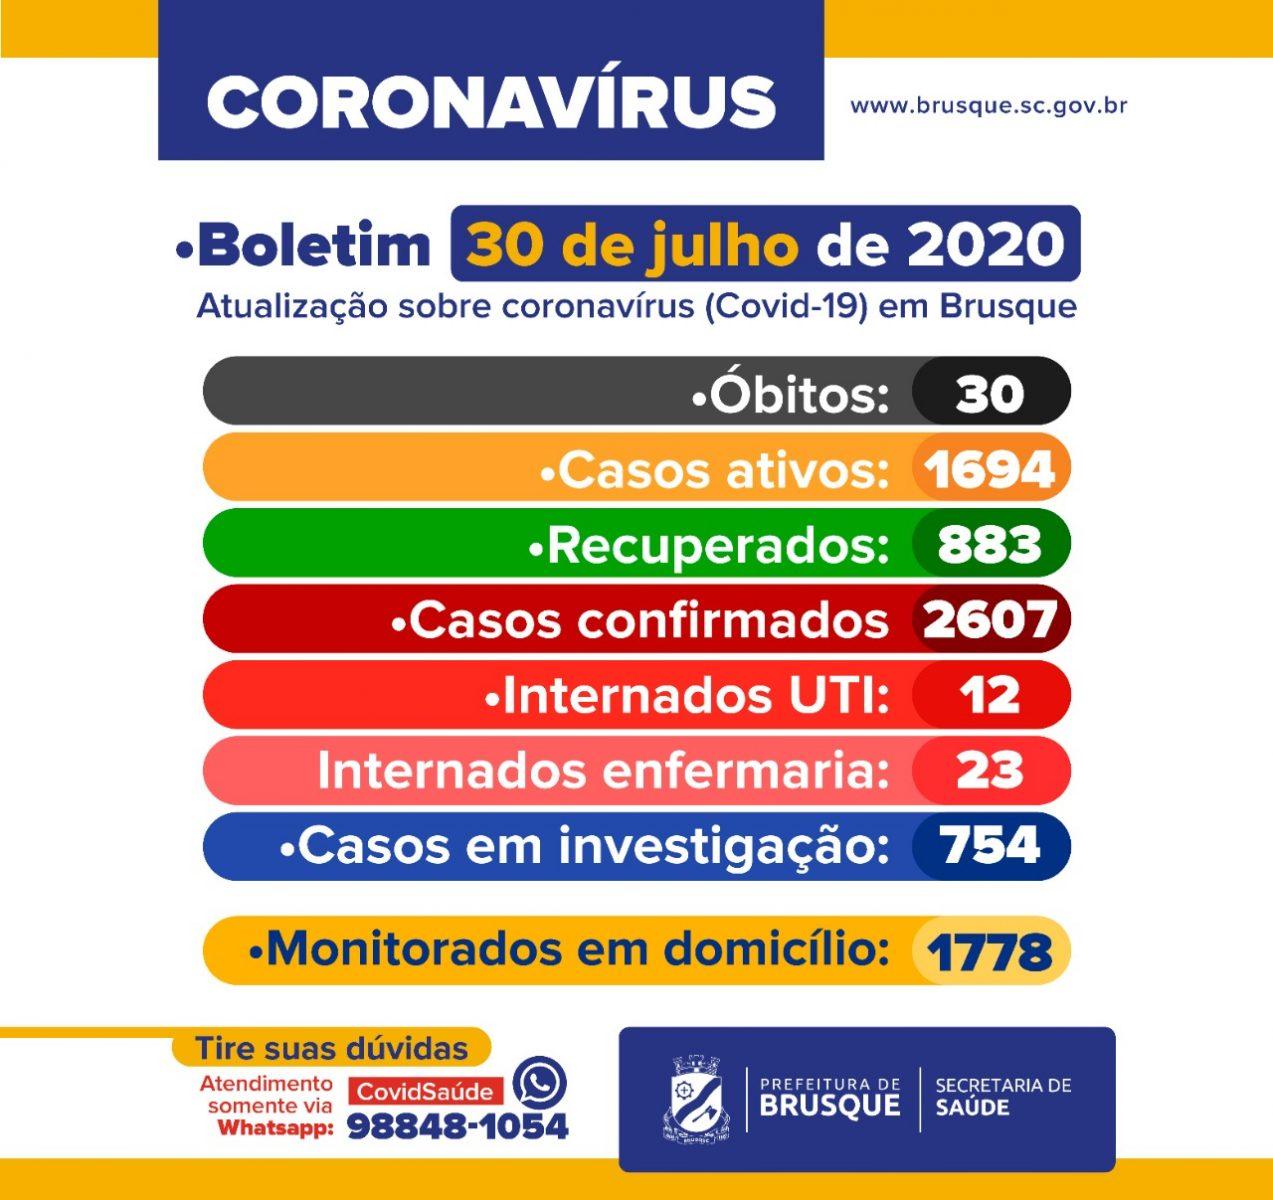 Confira o Boletim Epidemiológico desta quinta-feira (30)